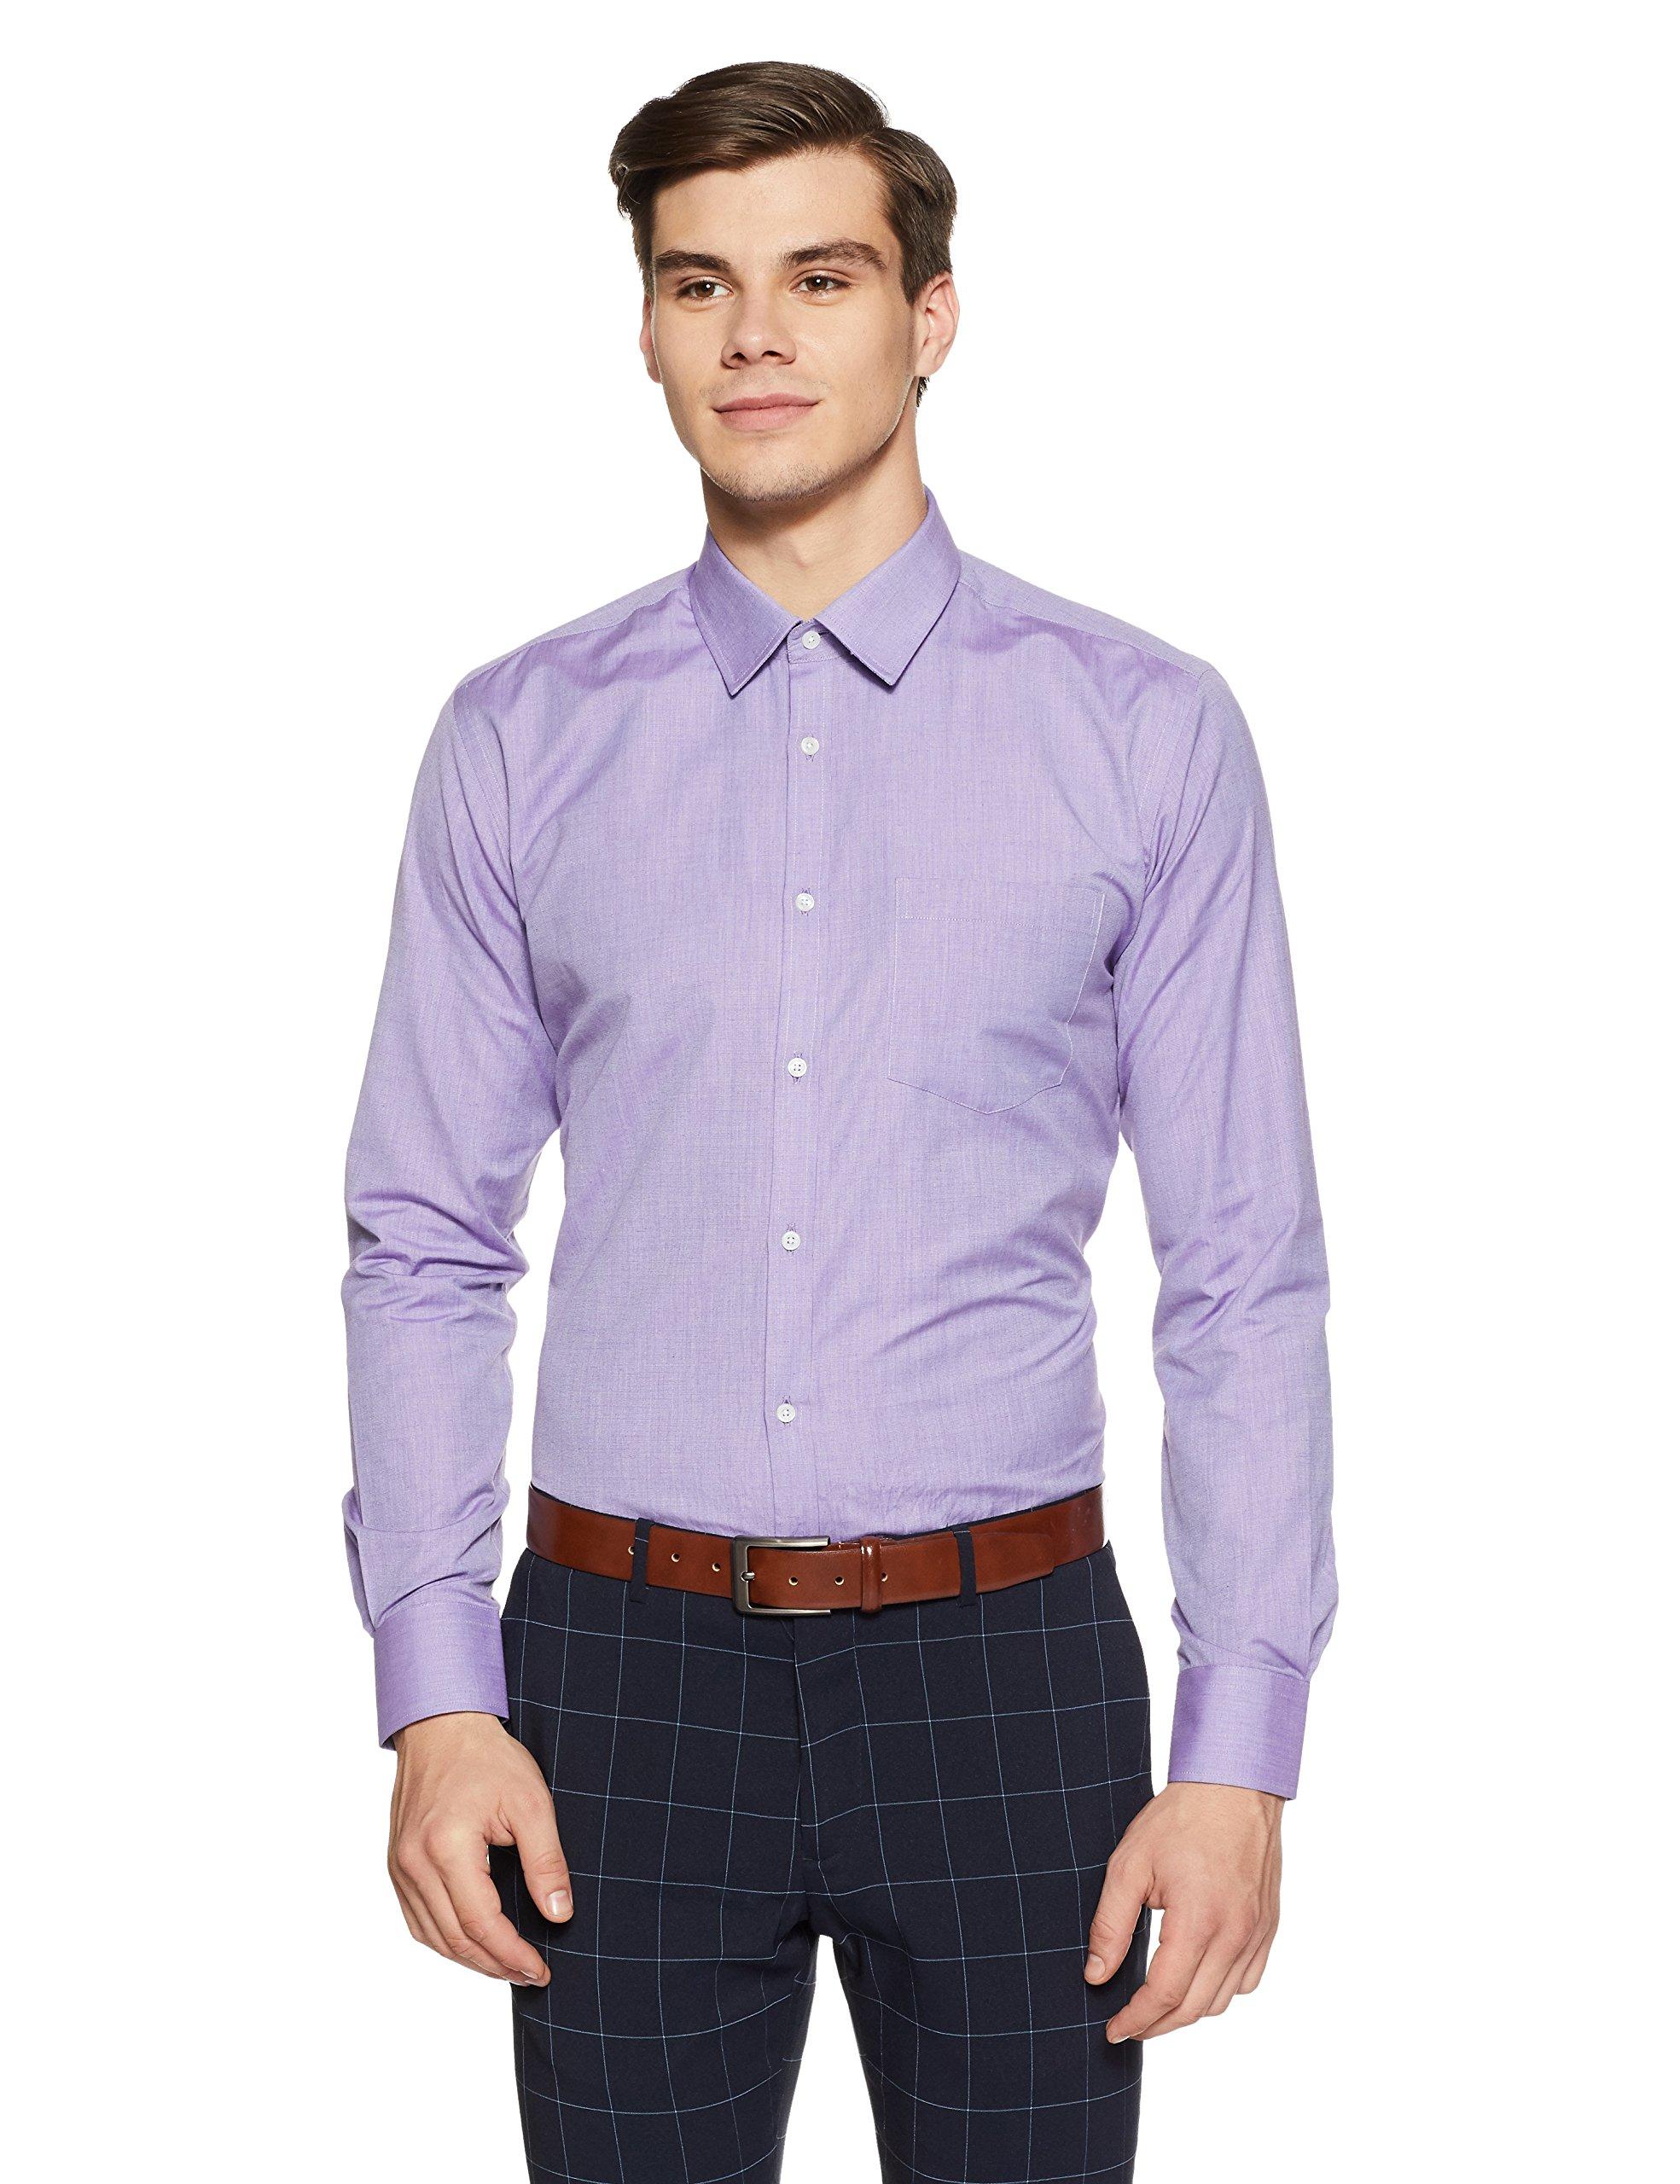 fefc17e8 Park Avenue Men's Solid Slim Fit Formal Shirt - Orawish